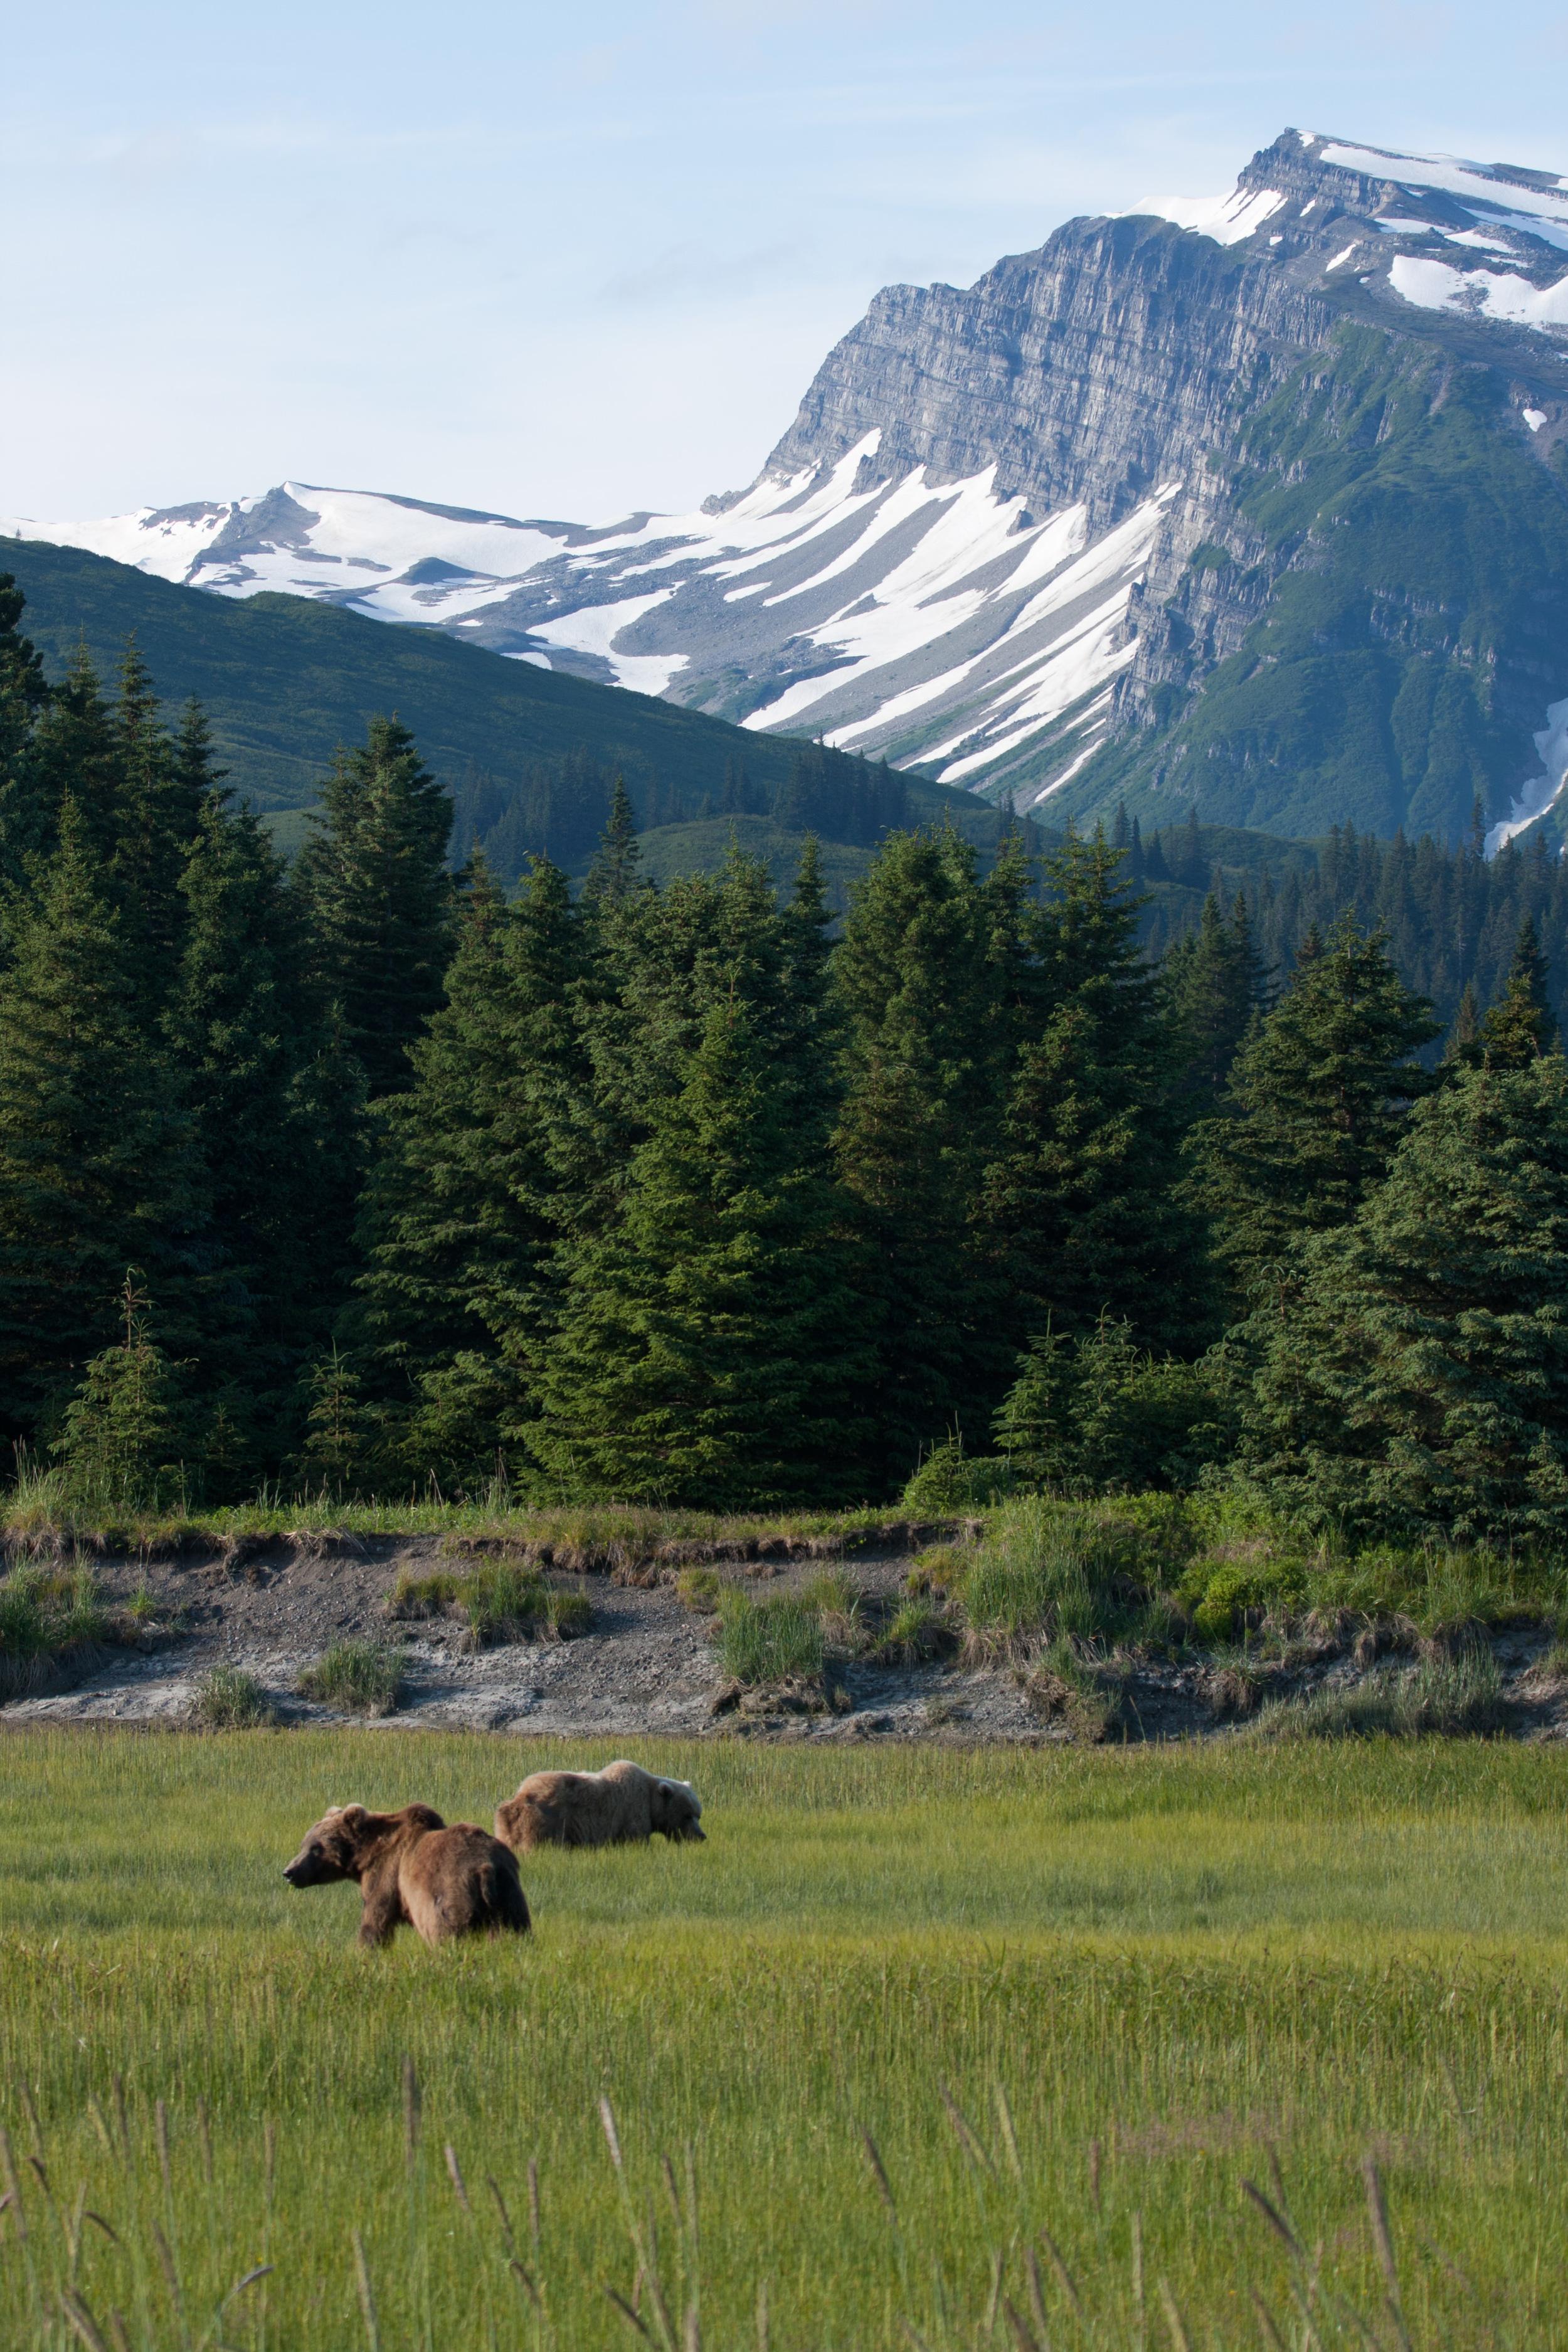 Two Coastal Brown Bears Graze In The Salt Marsh At Silver Salmon Creek. –(PHOTO: NPS/ K. JALONE)